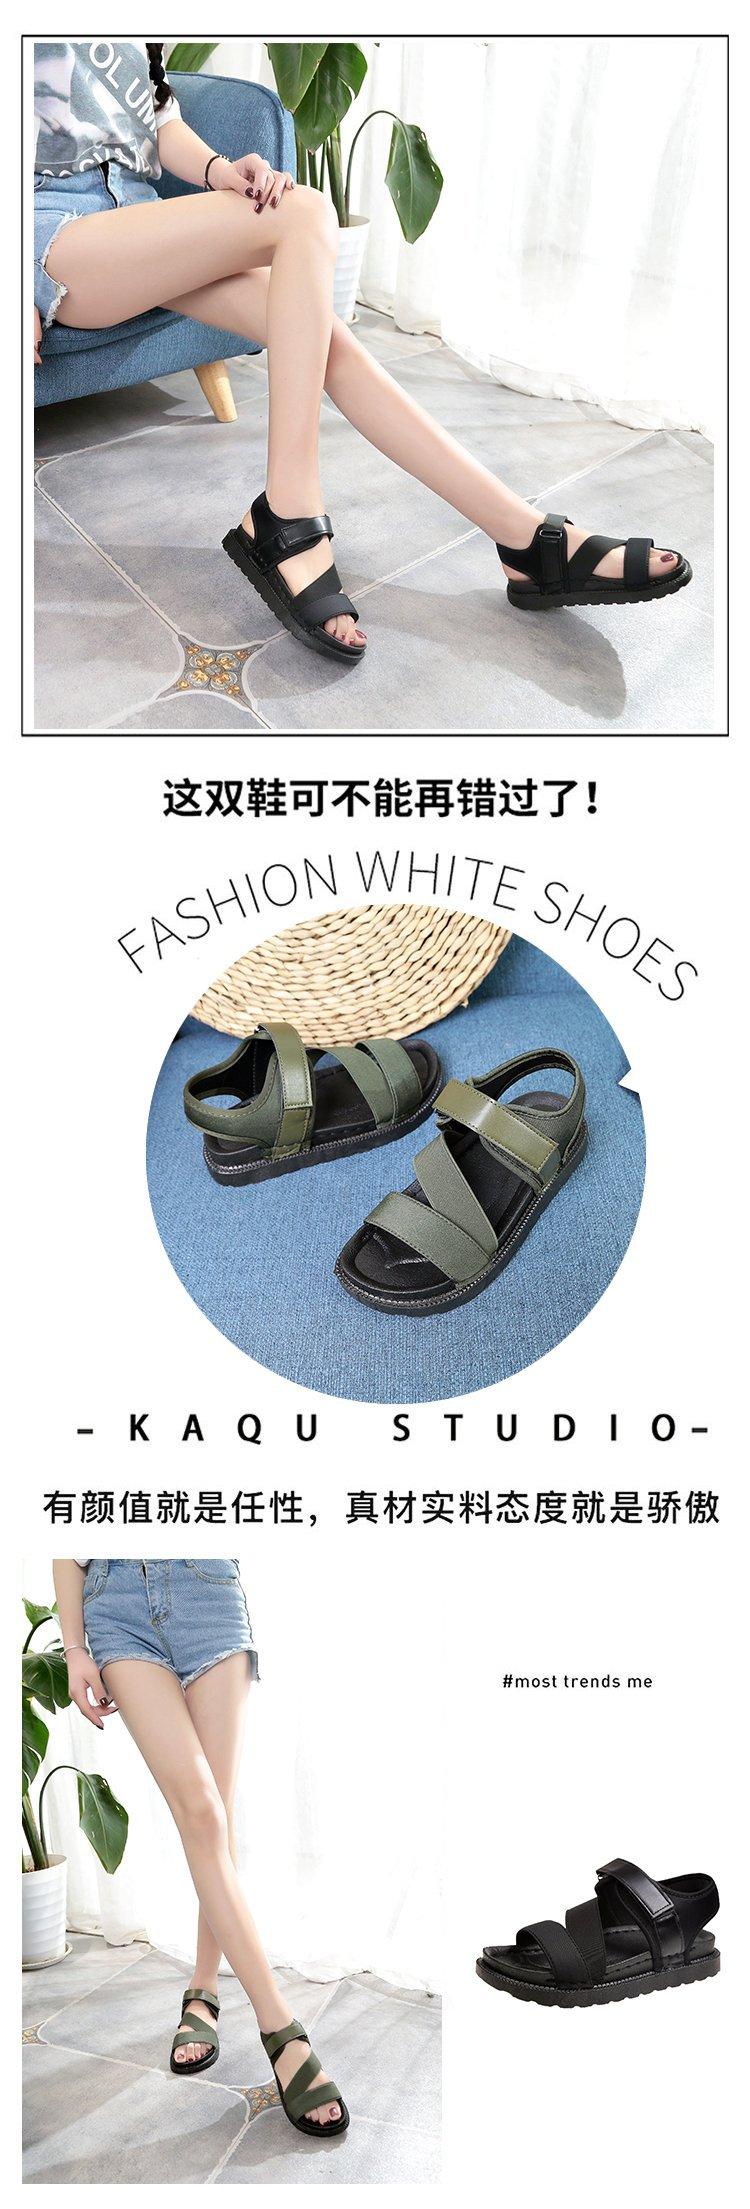 Summer Sandalias Mujer 2019 Shoes Woman Classics Gladiator Hook Loop Sandals Women Shoes Casual Flat Platform Block Heel Shoes 9